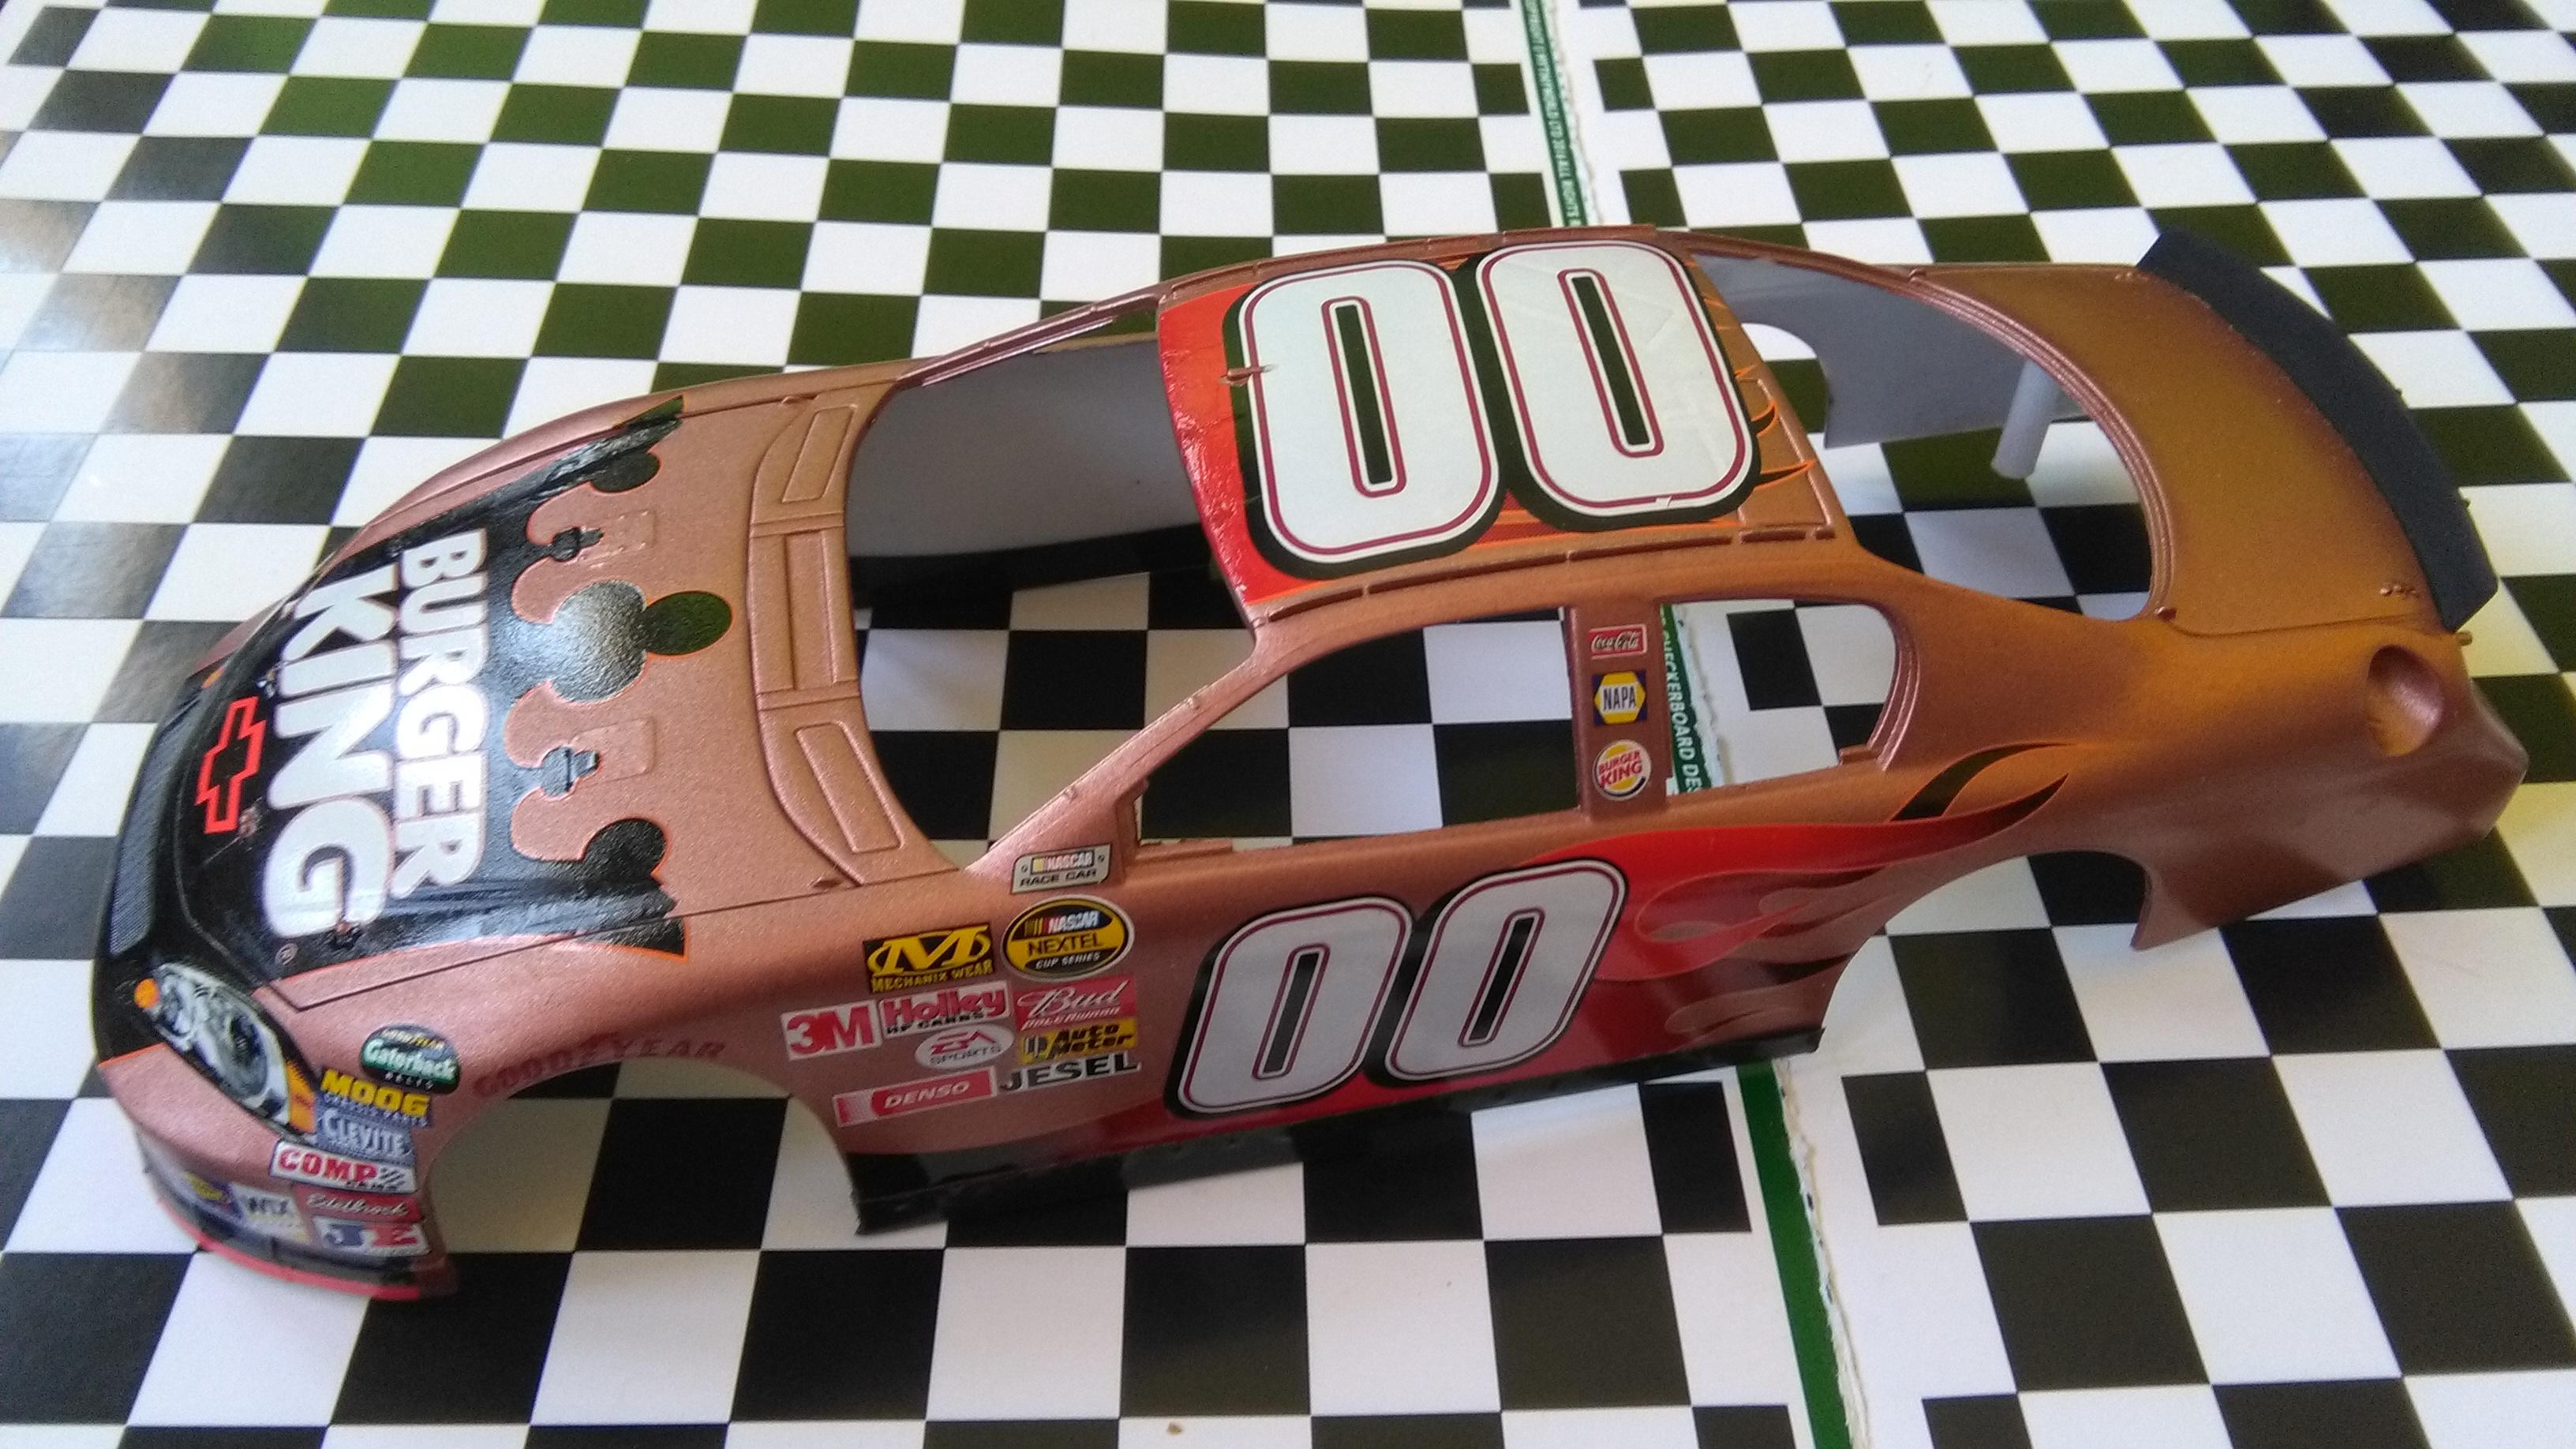 Chevy Monte-Carlo 2006 #00 Bill Elliott Burger King 139454C2006K